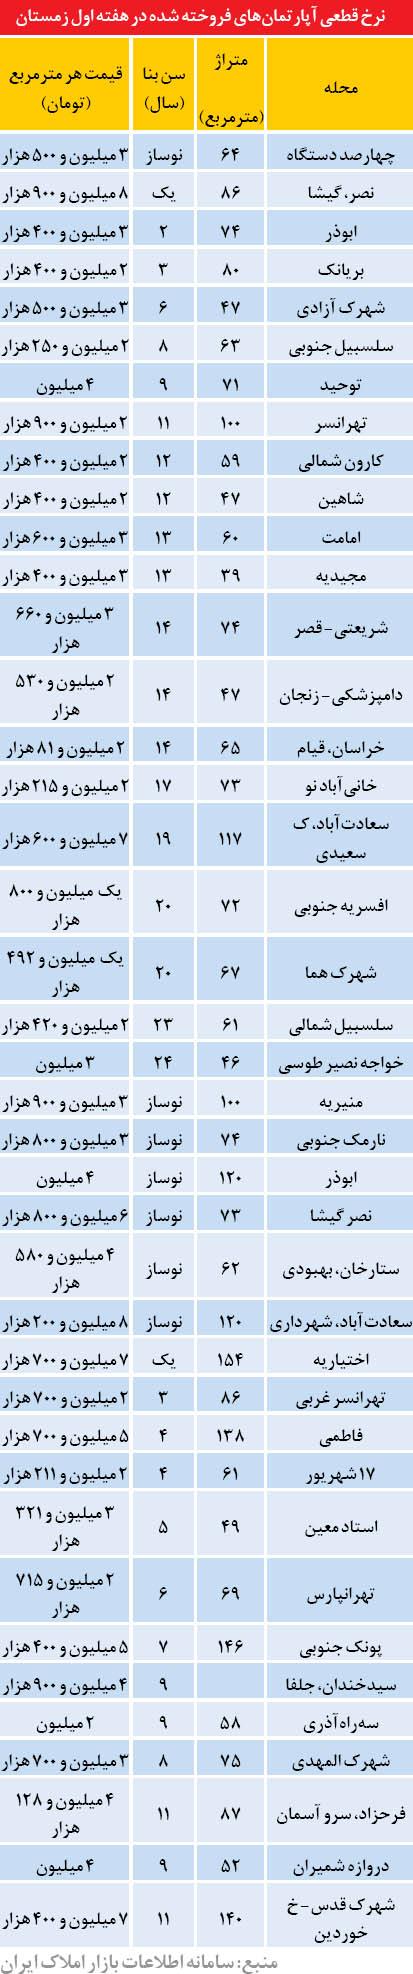 قیمت آپارتمان در زمستان تهران (جدول)